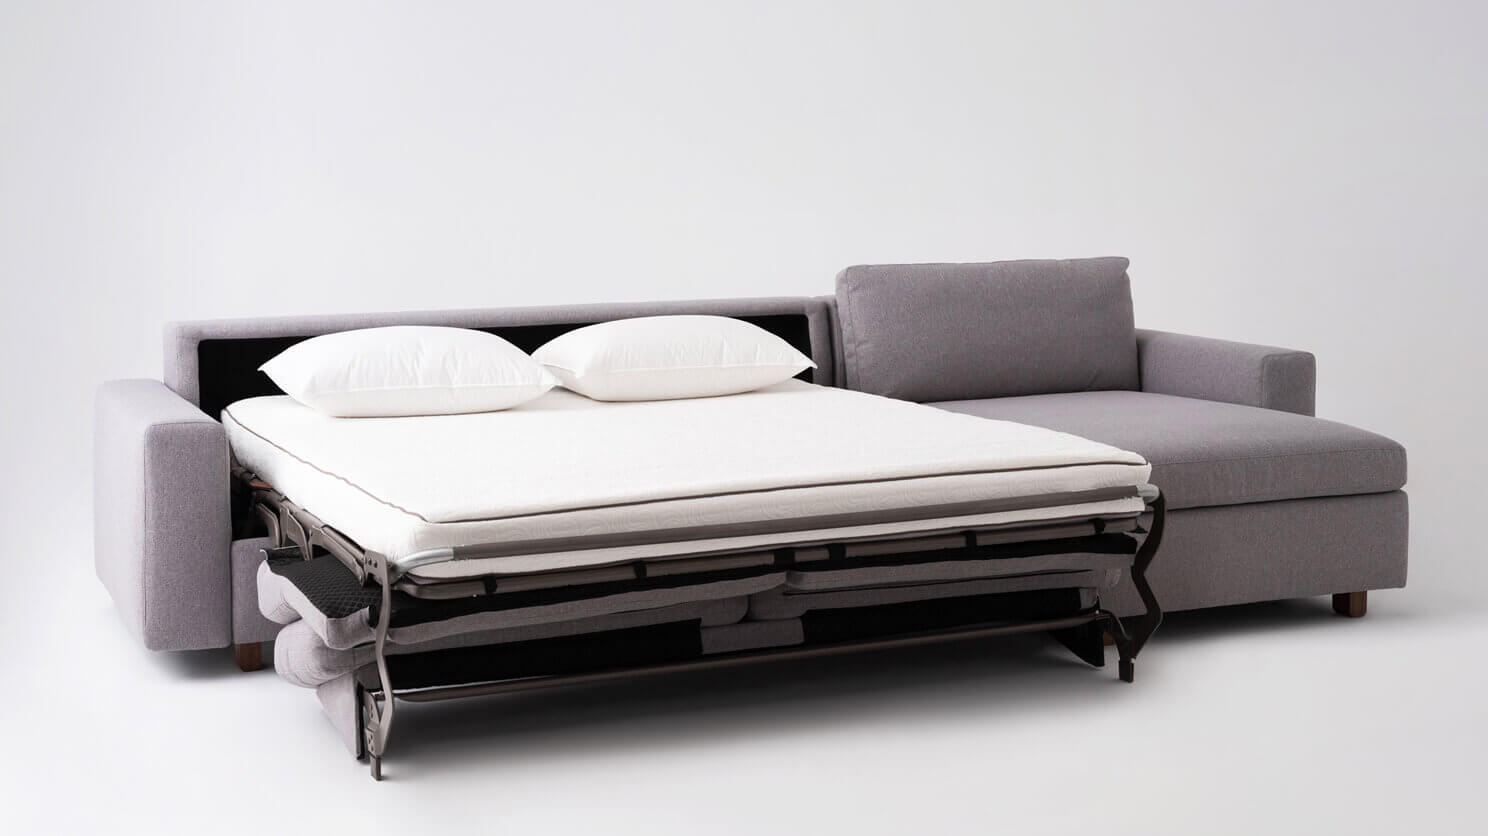 Reva Sectional Storage Sofa Bed Raf Queen Size Mattress M